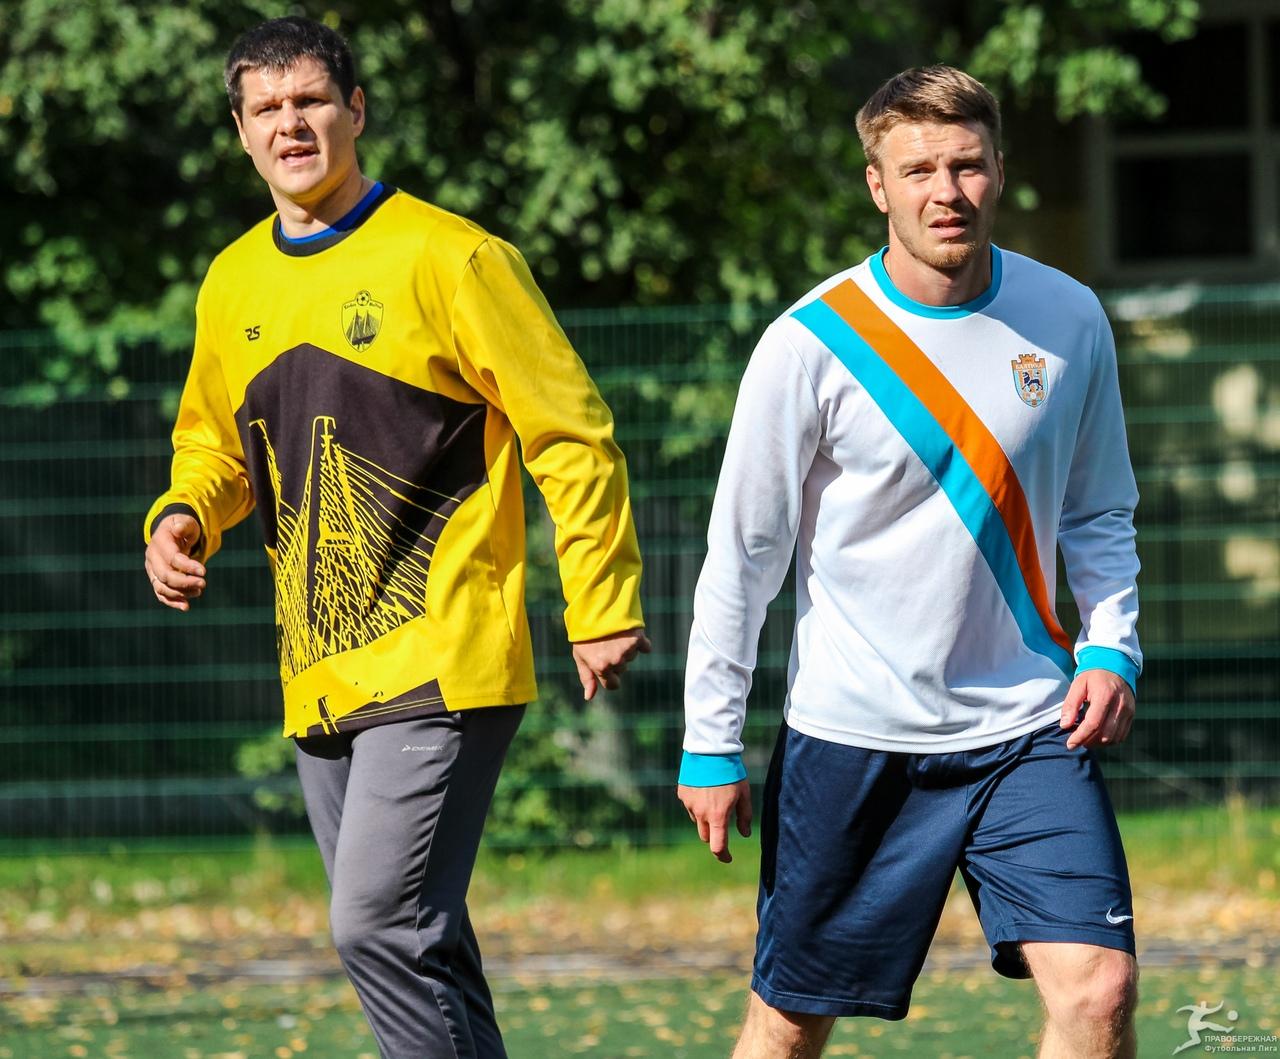 Станислав Сосненко (Совхоз Юнайтед) и Денис Шубин (Балтика)